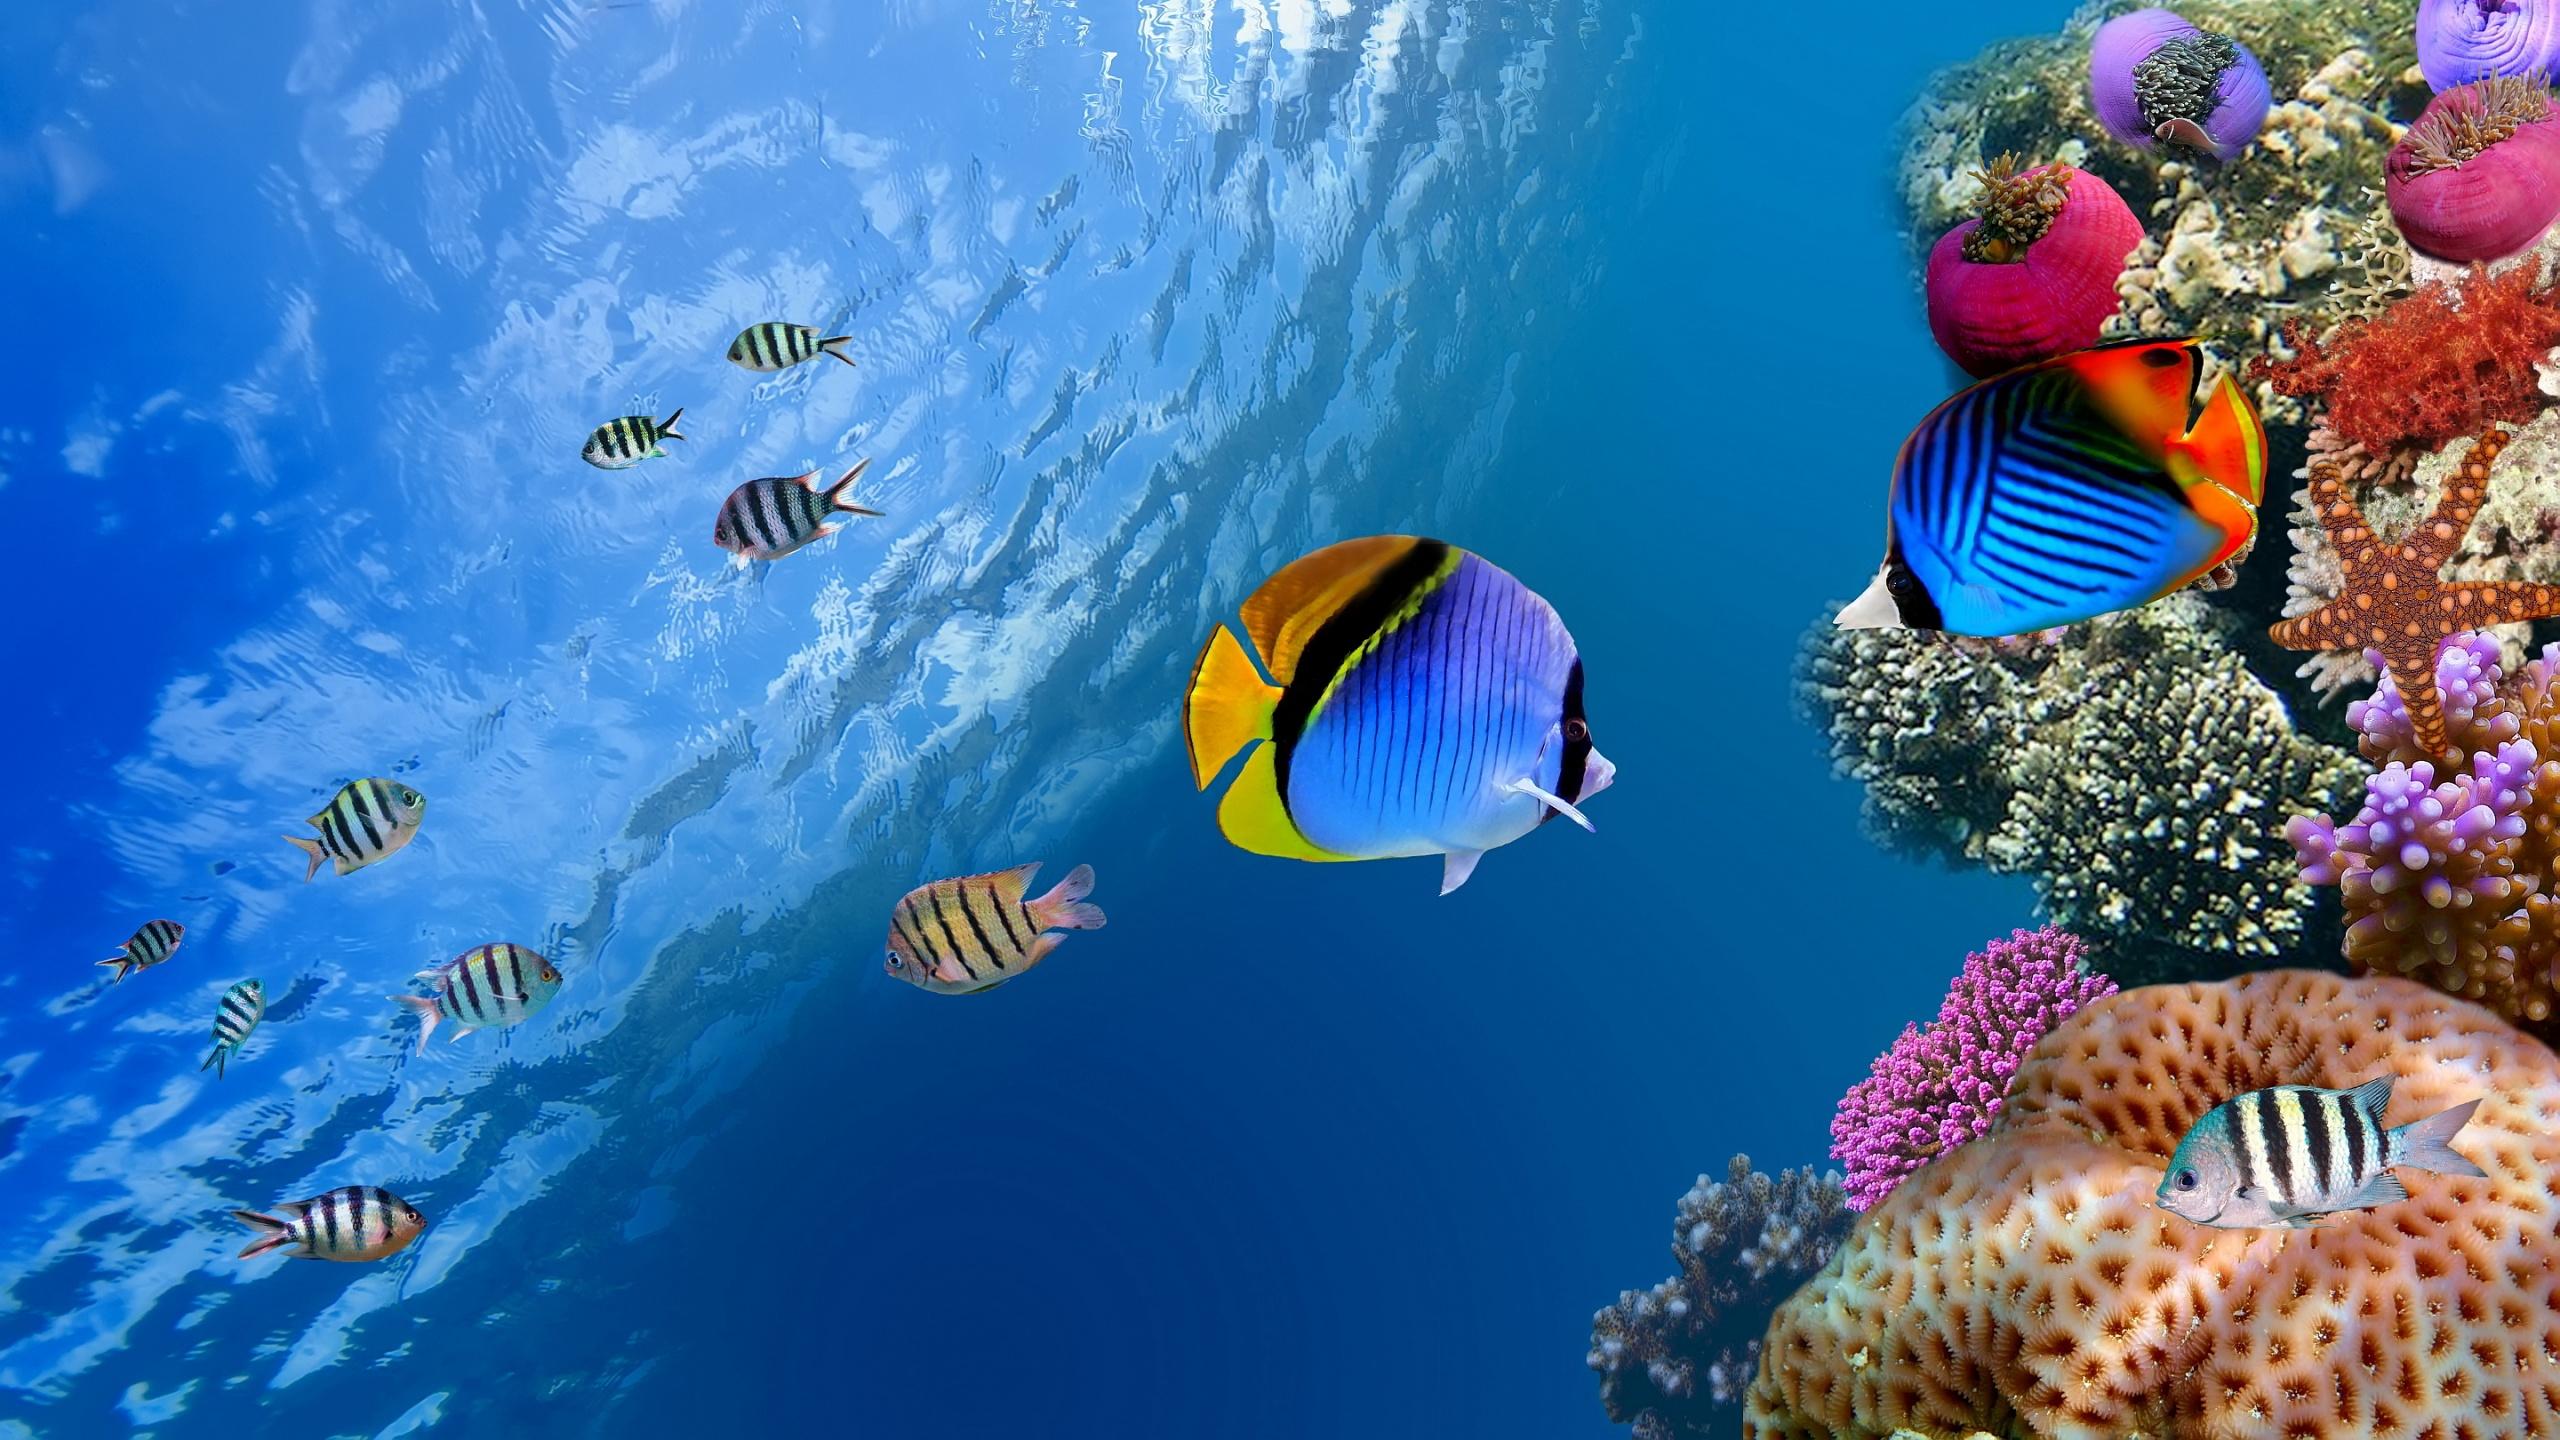 underwater-coral-fish-2560x1440